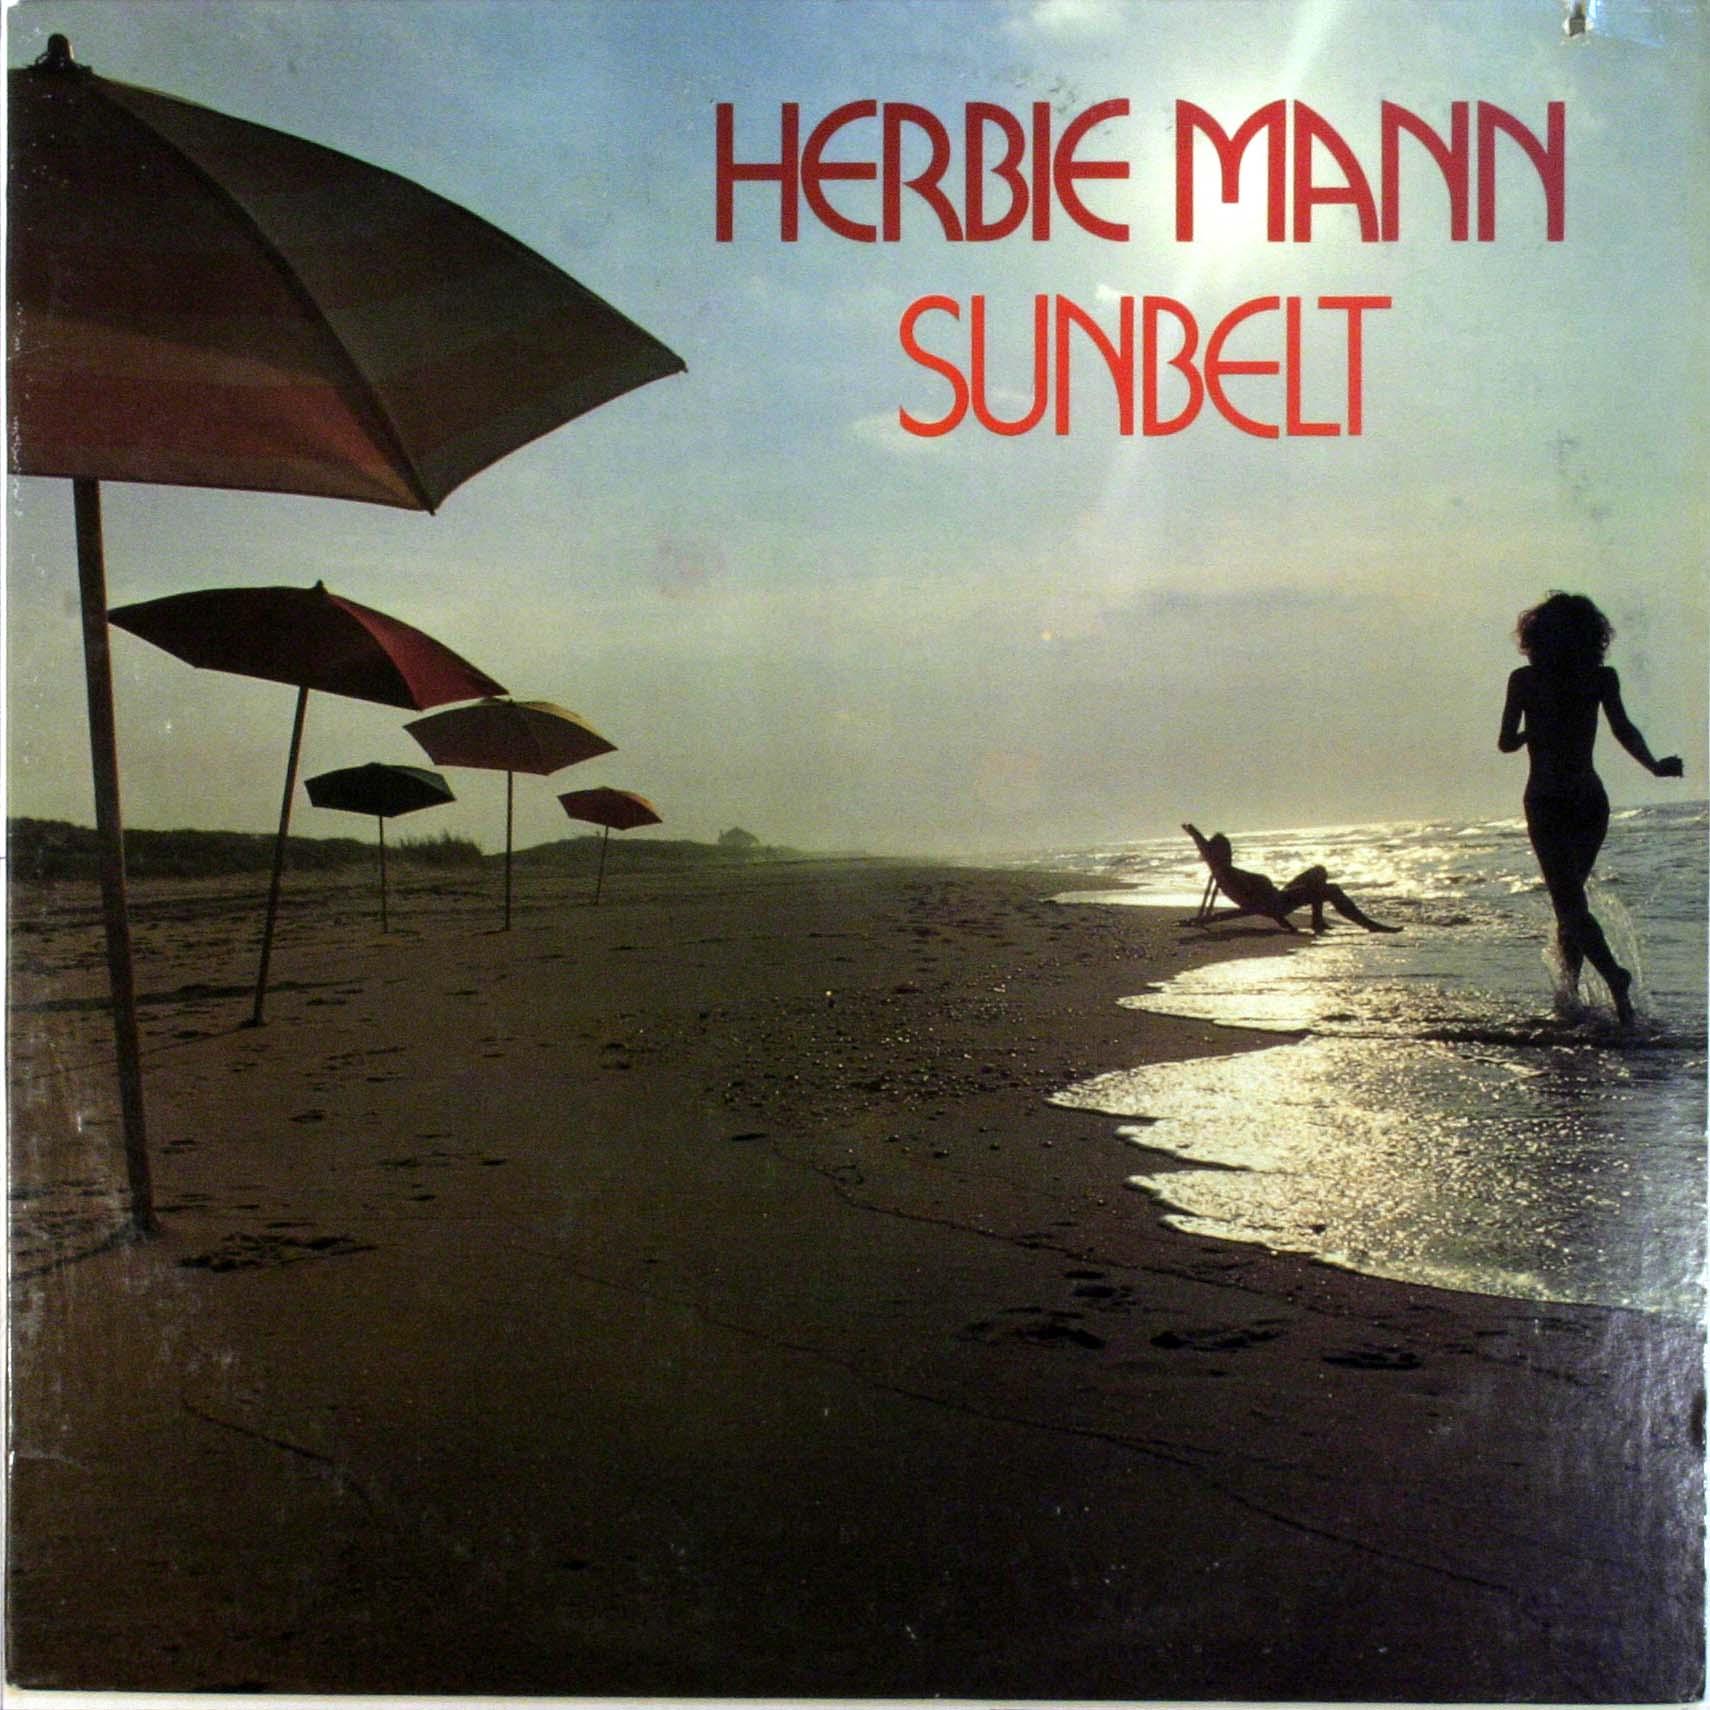 Herbie Mann - Sunbelt Album